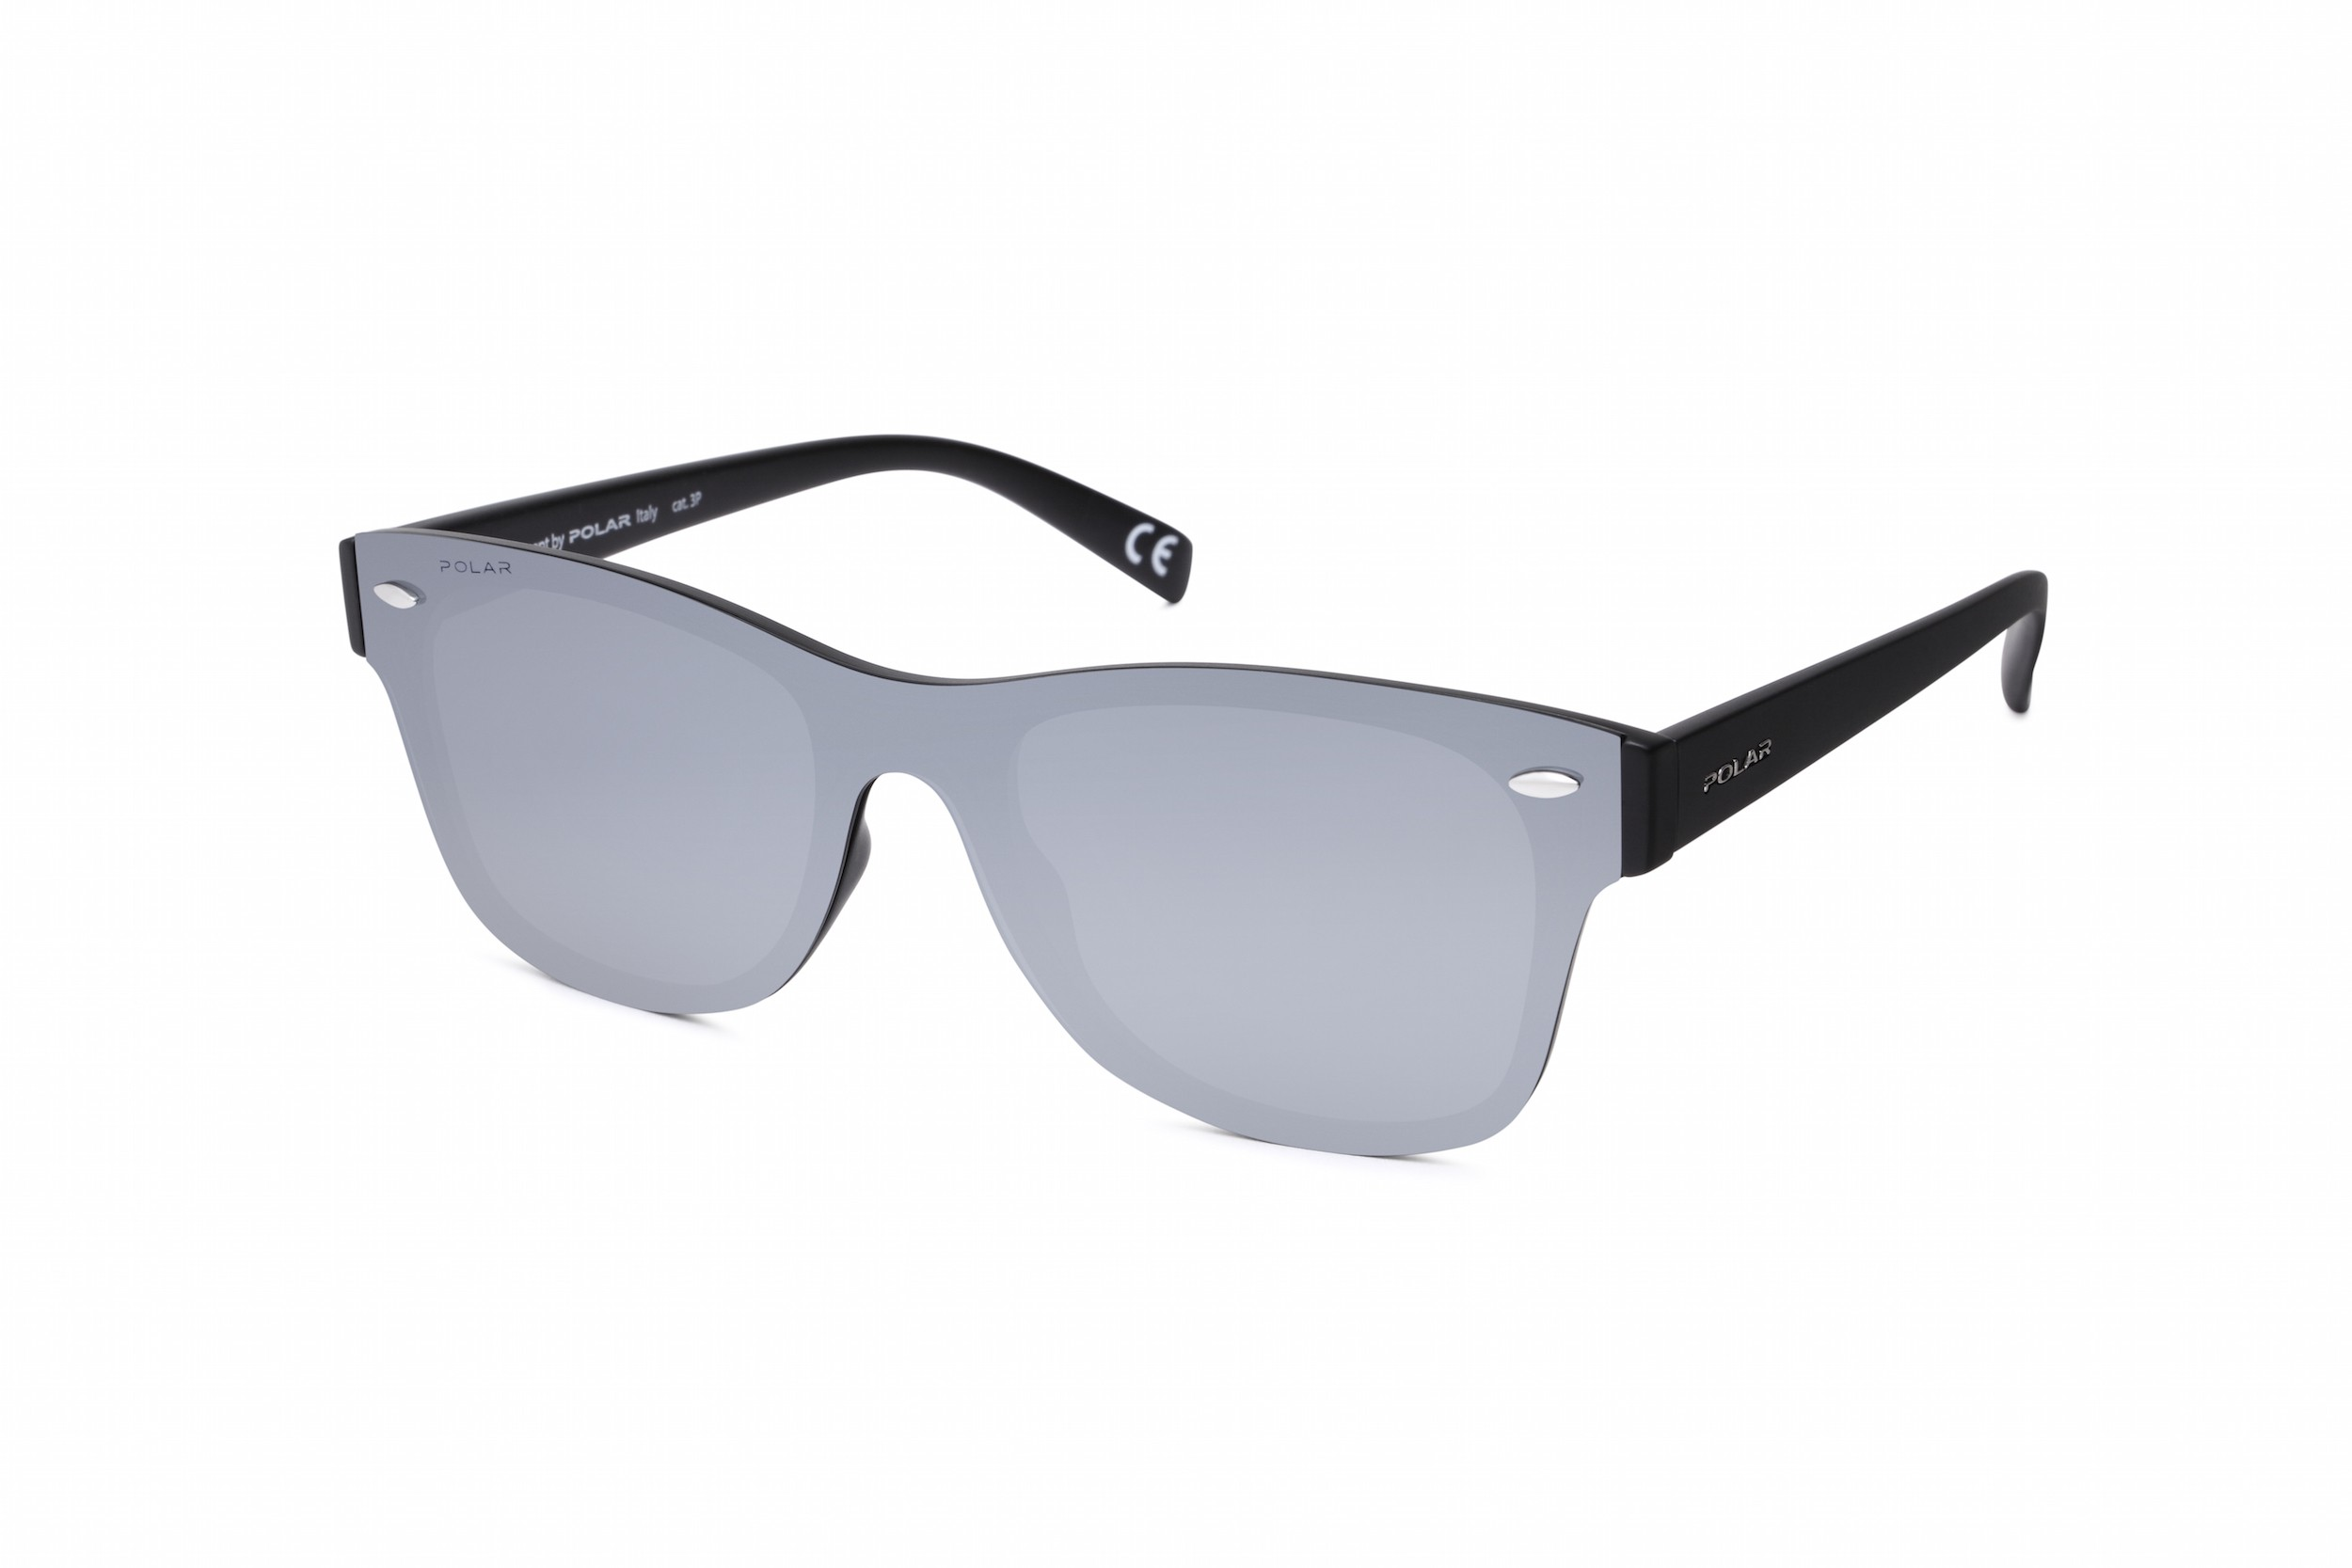 dc71cf223c Polar Sunglasses Italy Price - Restaurant and Palinka Bar